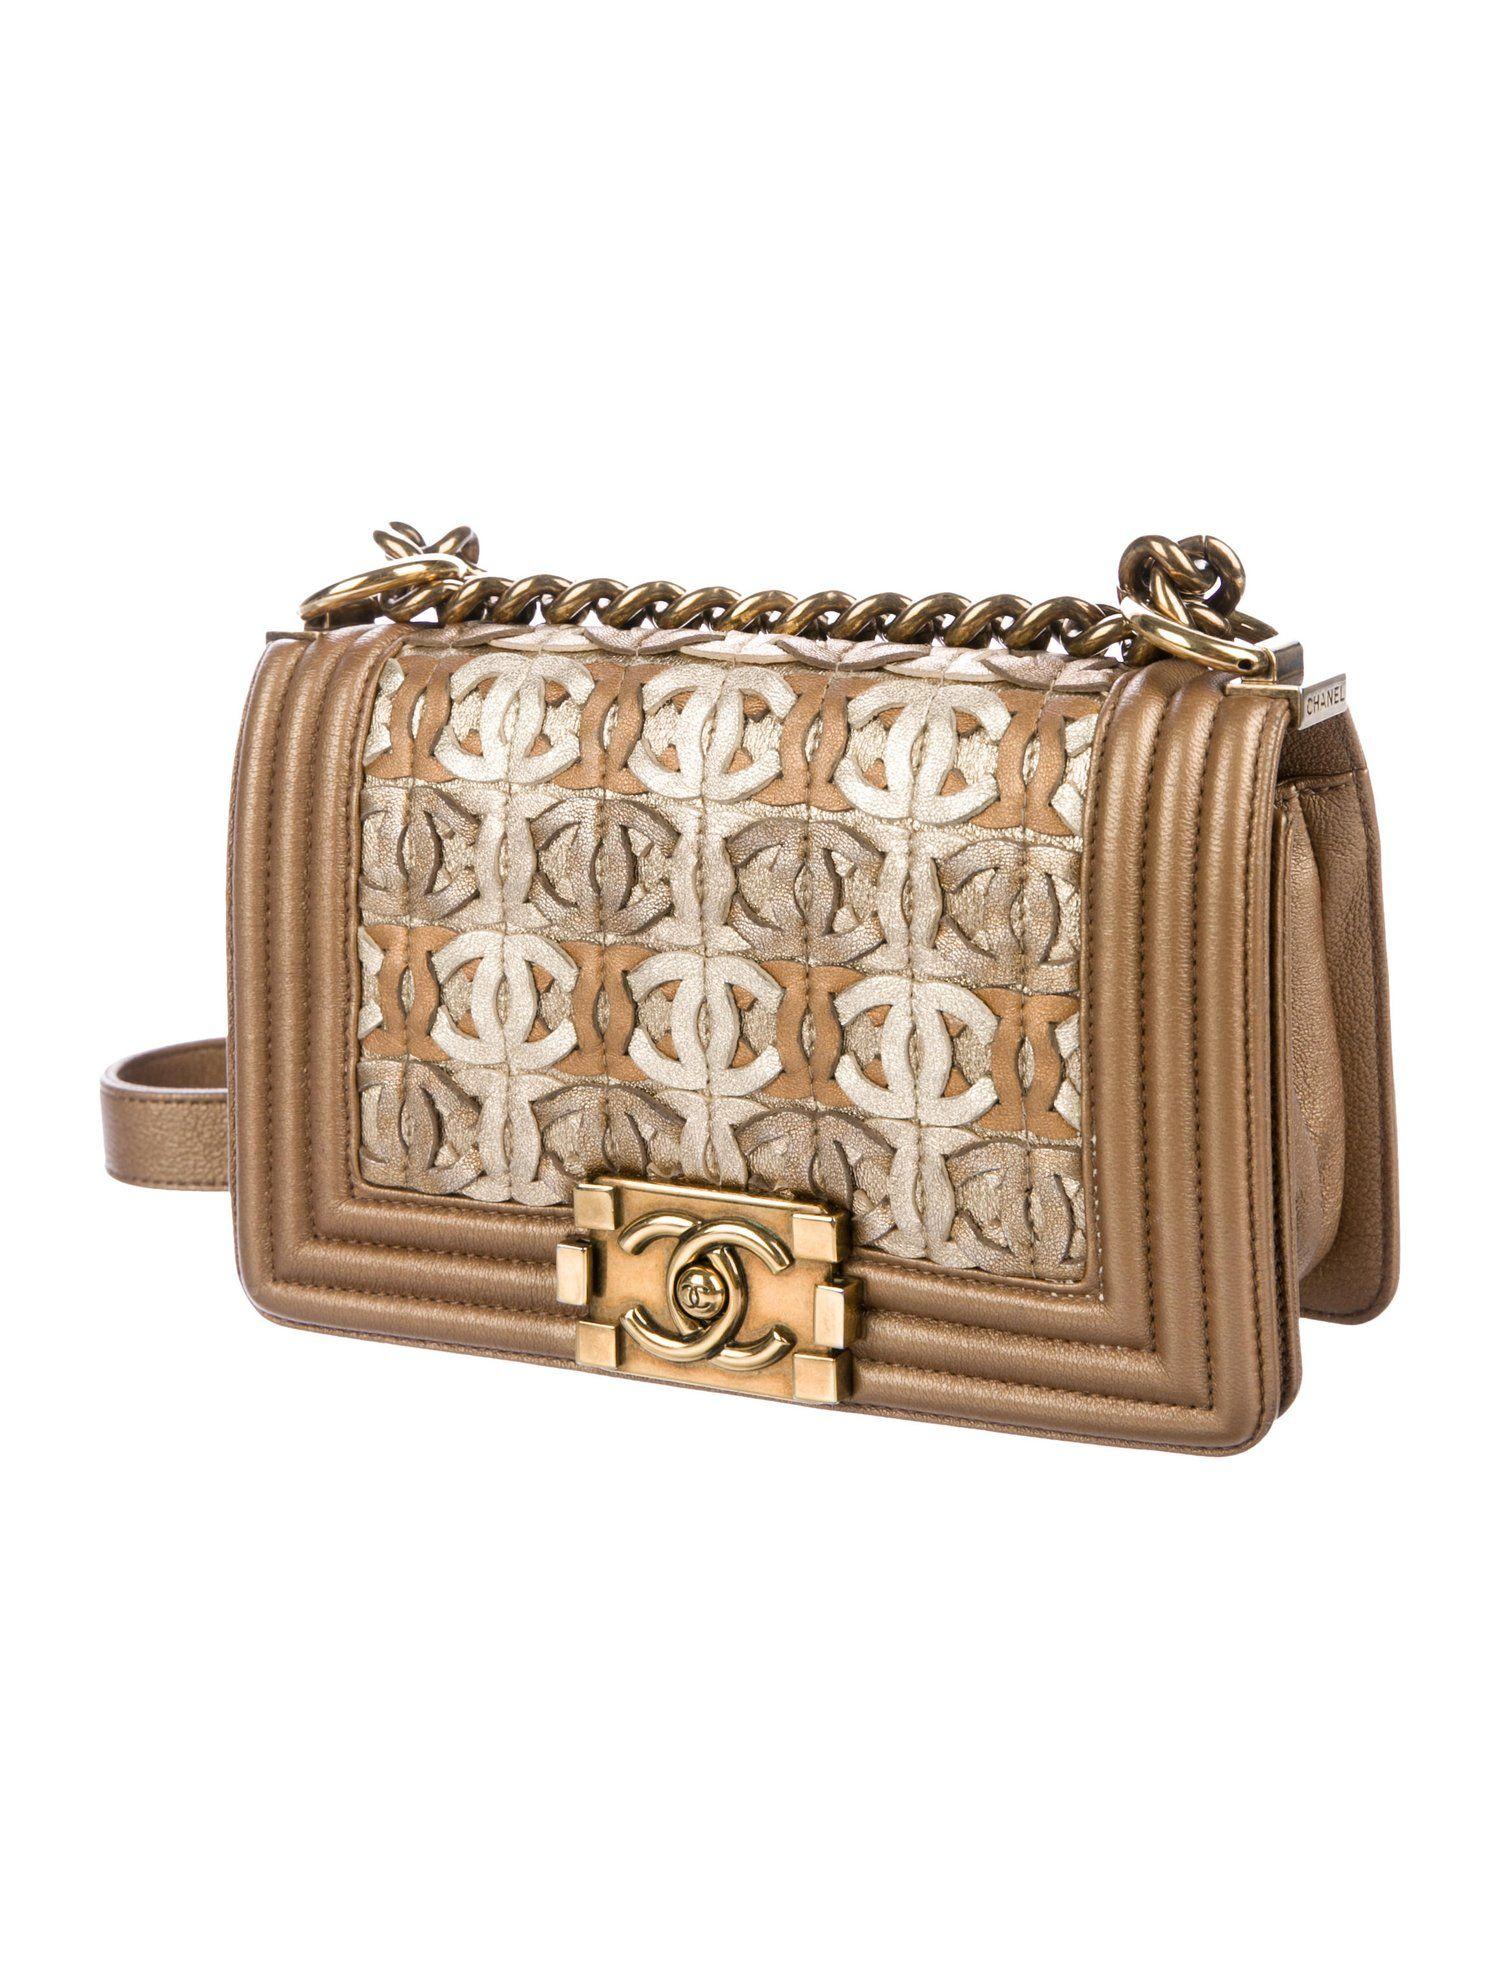 53585022e0702 Chanel Paris-Dubai Small Boy Bag - Handbags - CHA270357